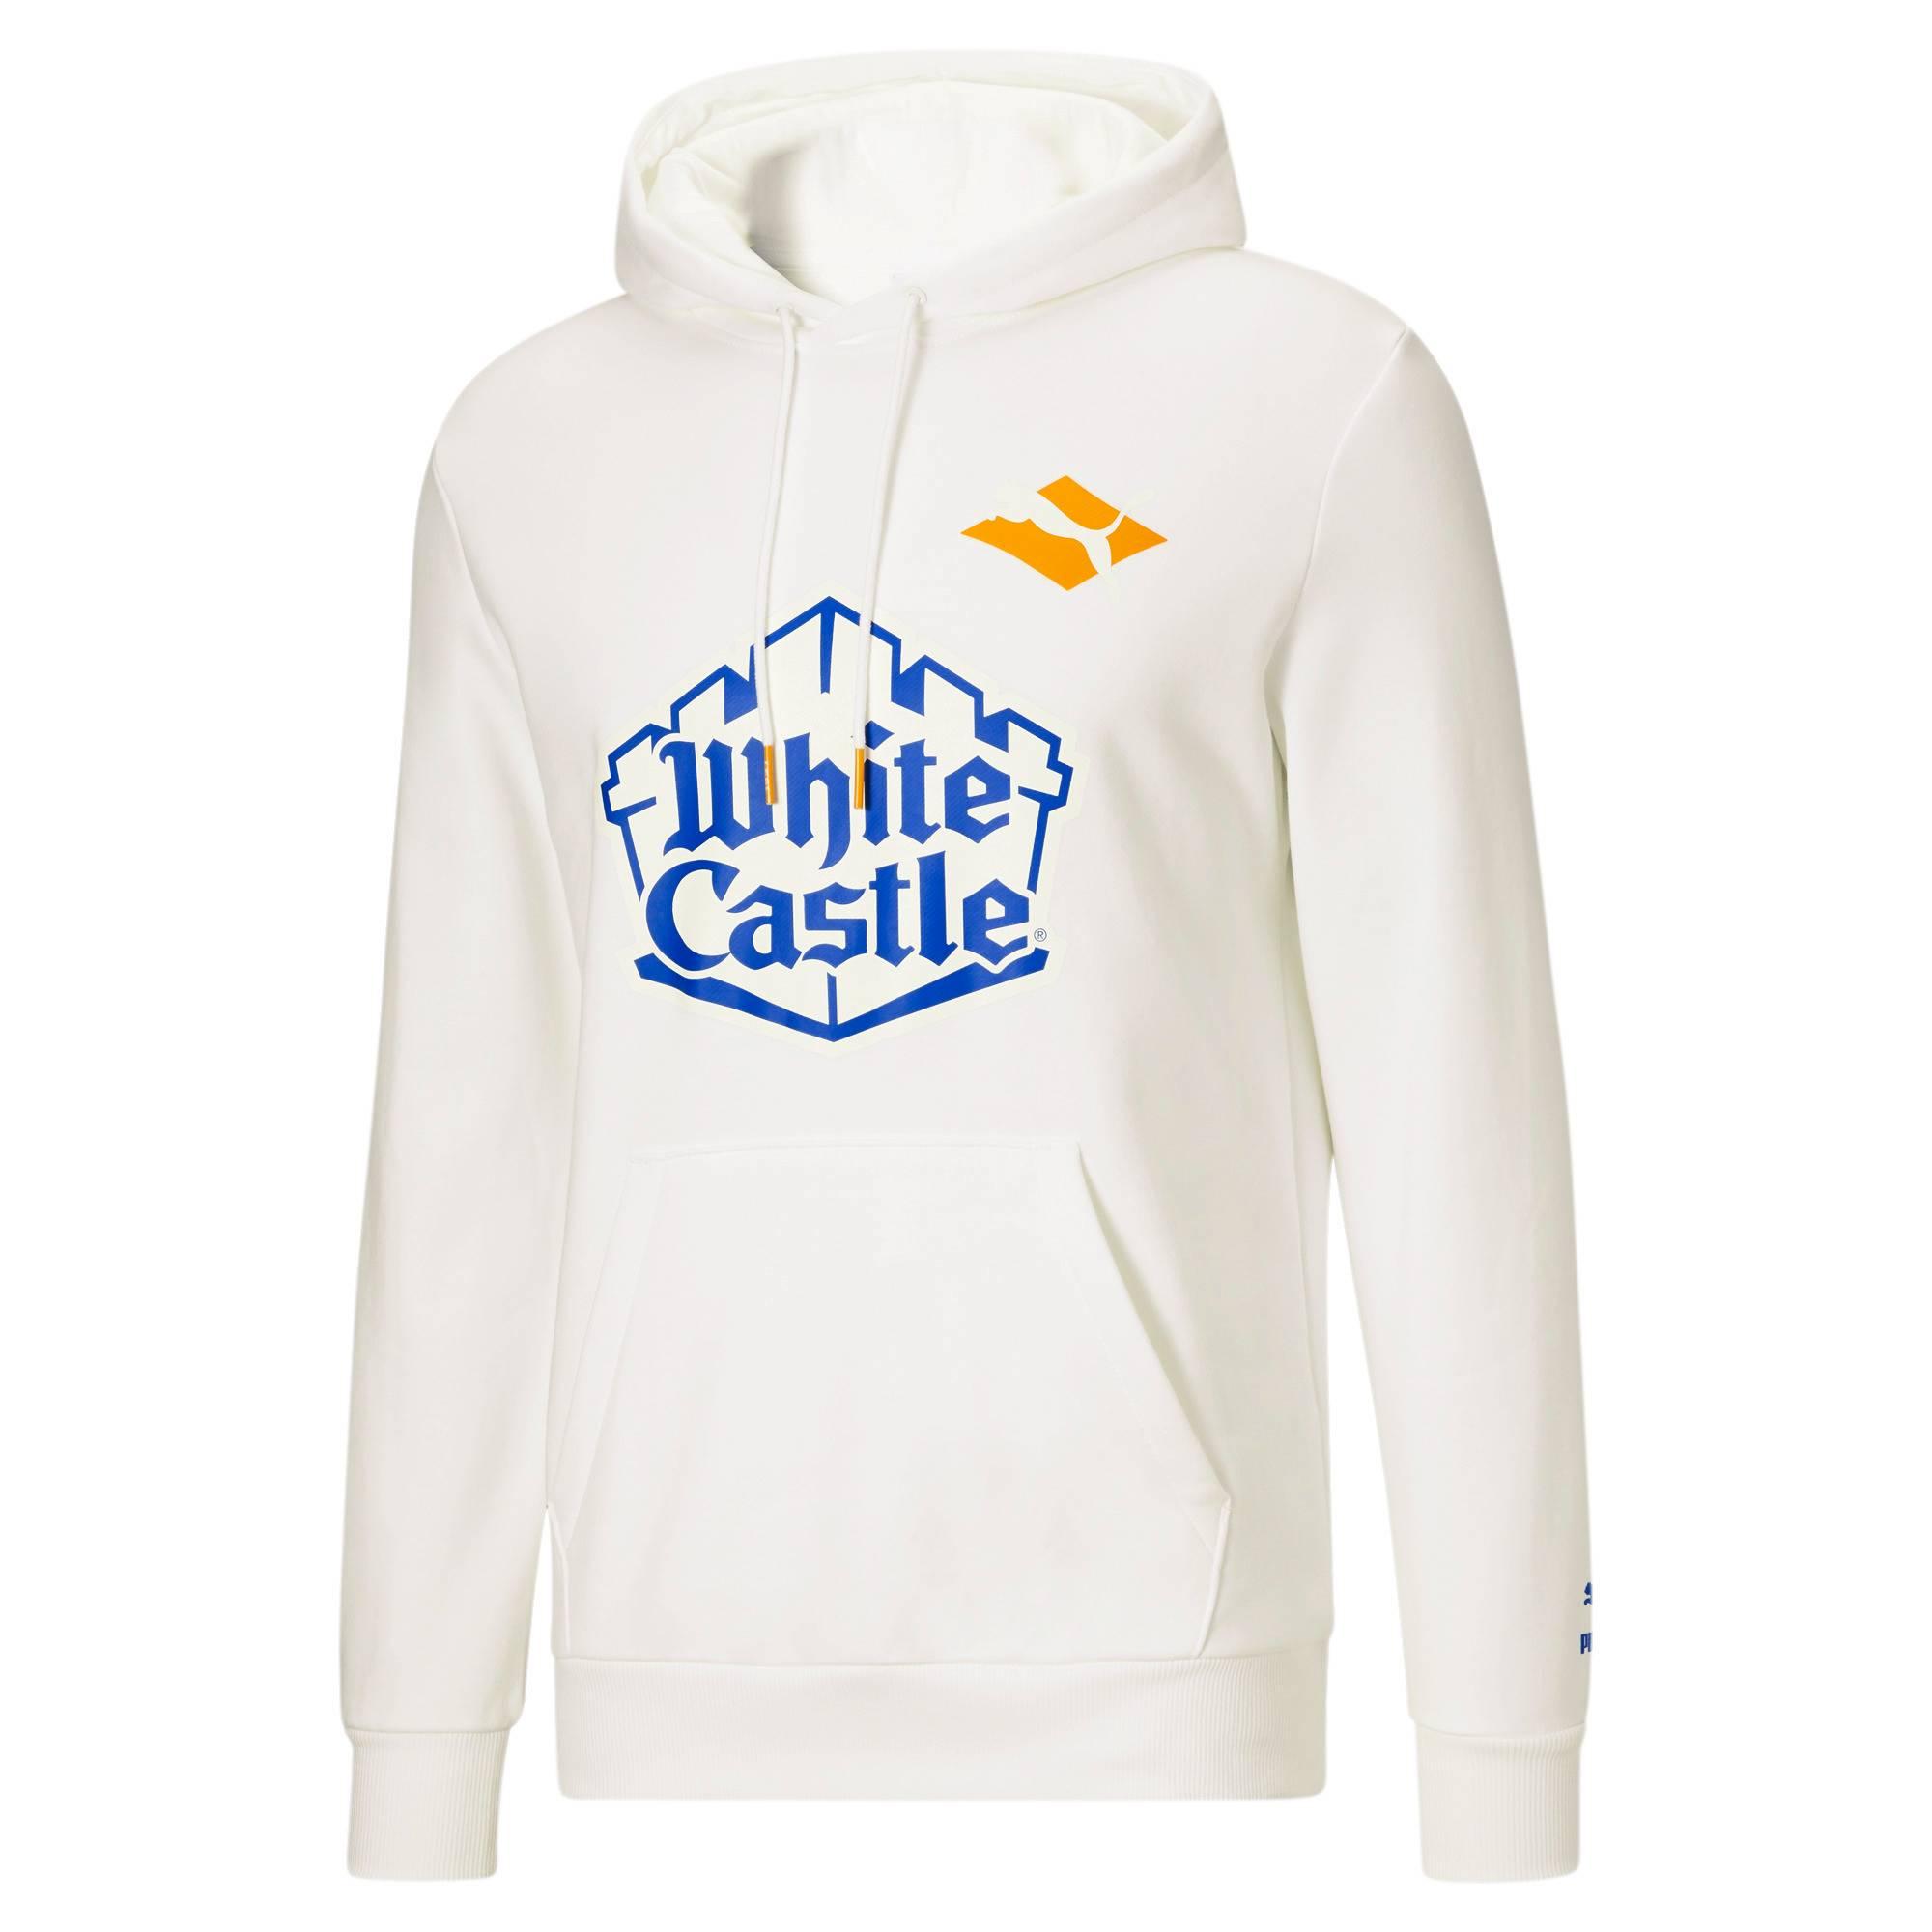 PUMA 和 White Castle 推出 100 岁生日系列